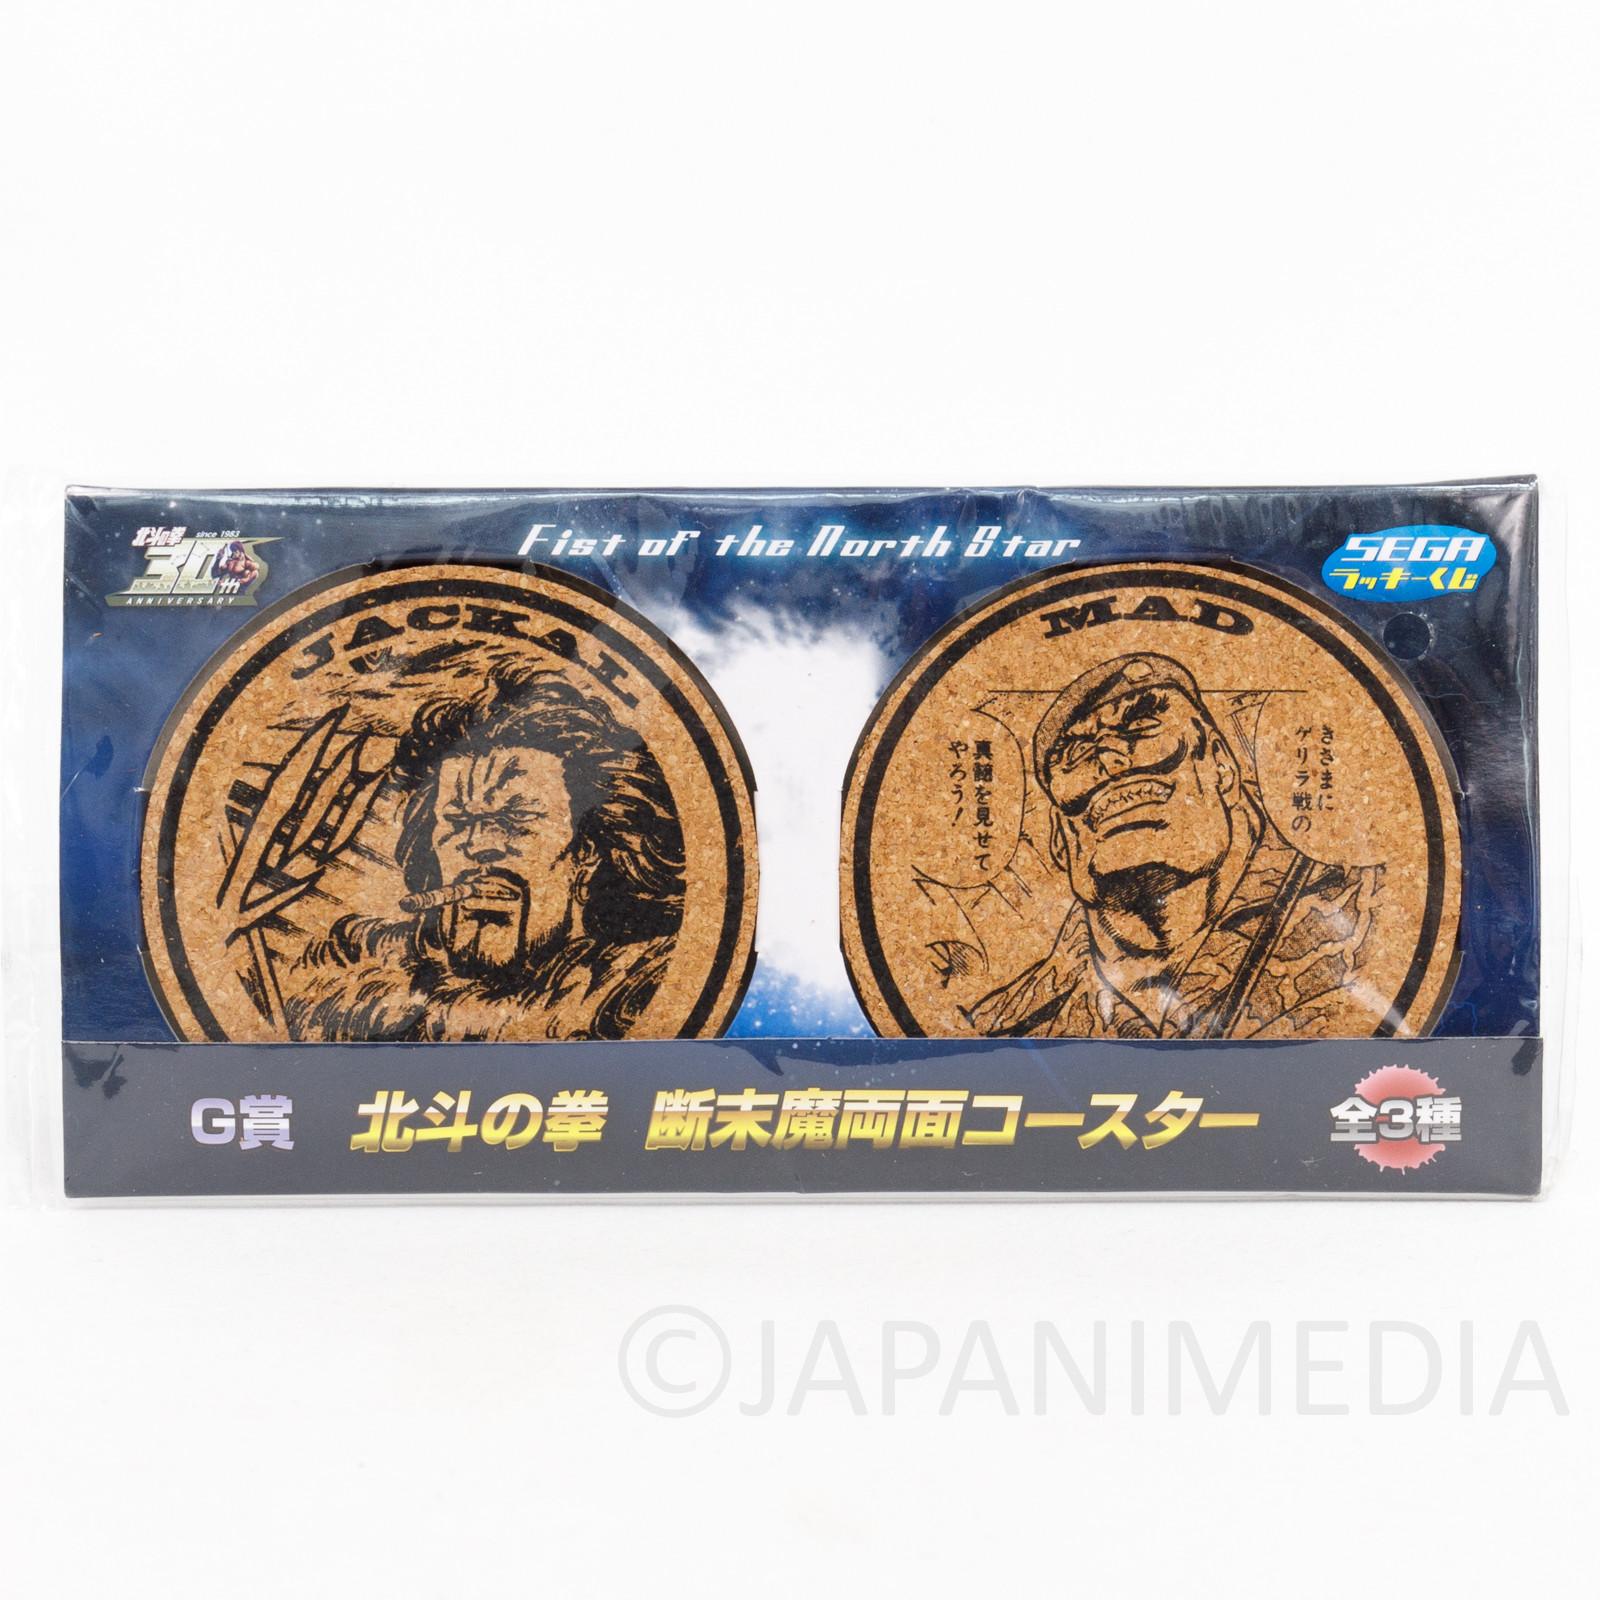 Fist of the North Star Jackal & Mad Cork Coaster Set JAPAN Hokuto no Ken